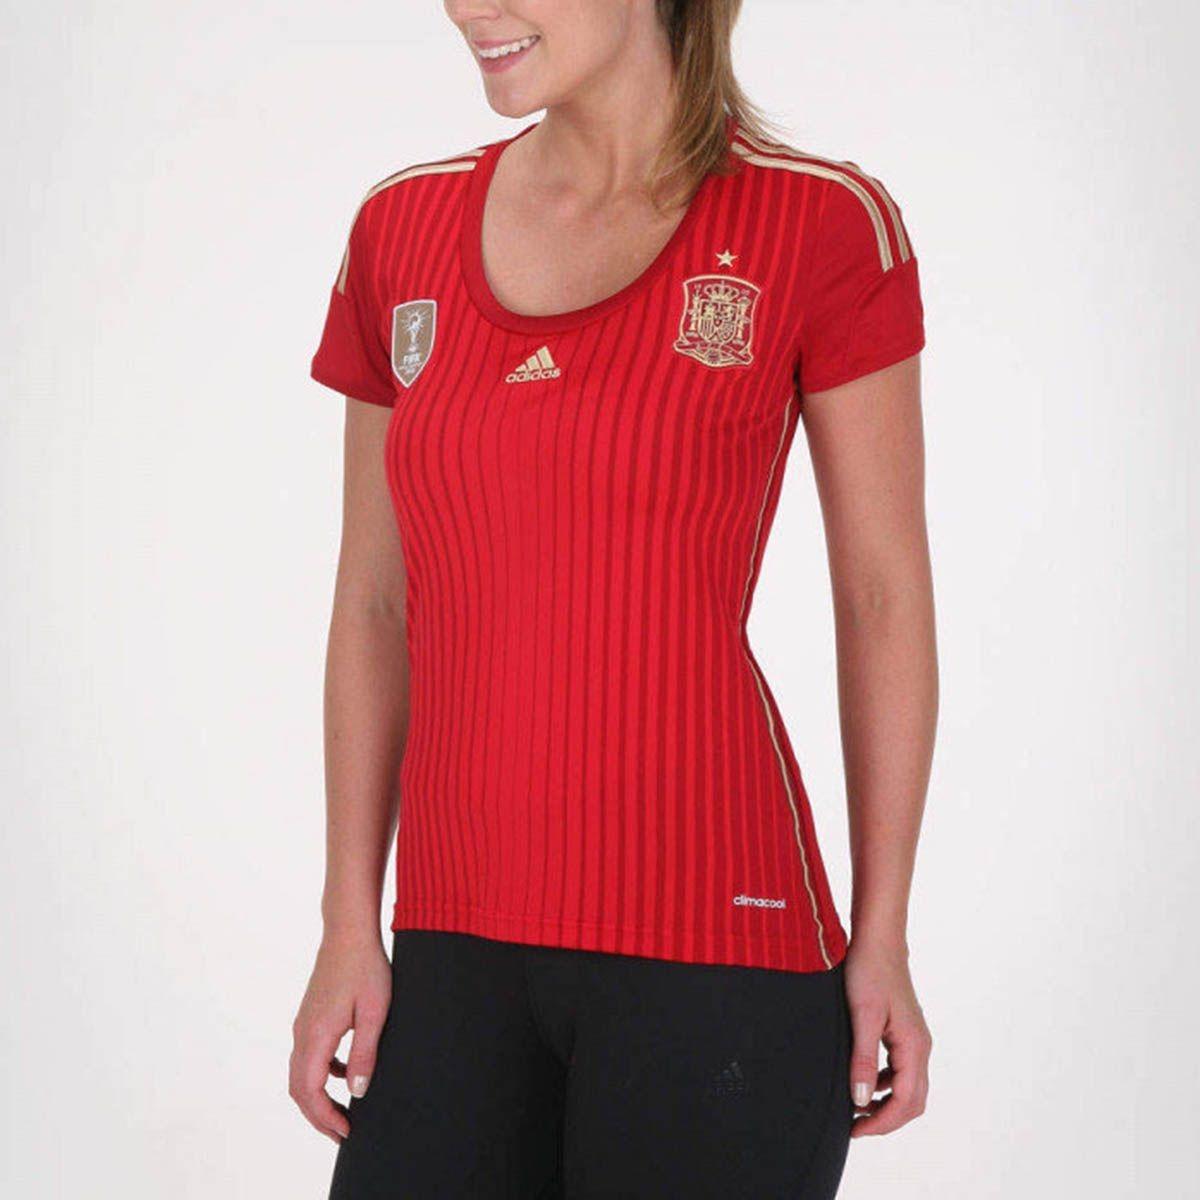 189b87b6cd Camisa Feminina adidas Espanha 2014 S nº Nova Orig C  Tag+nf - R ...